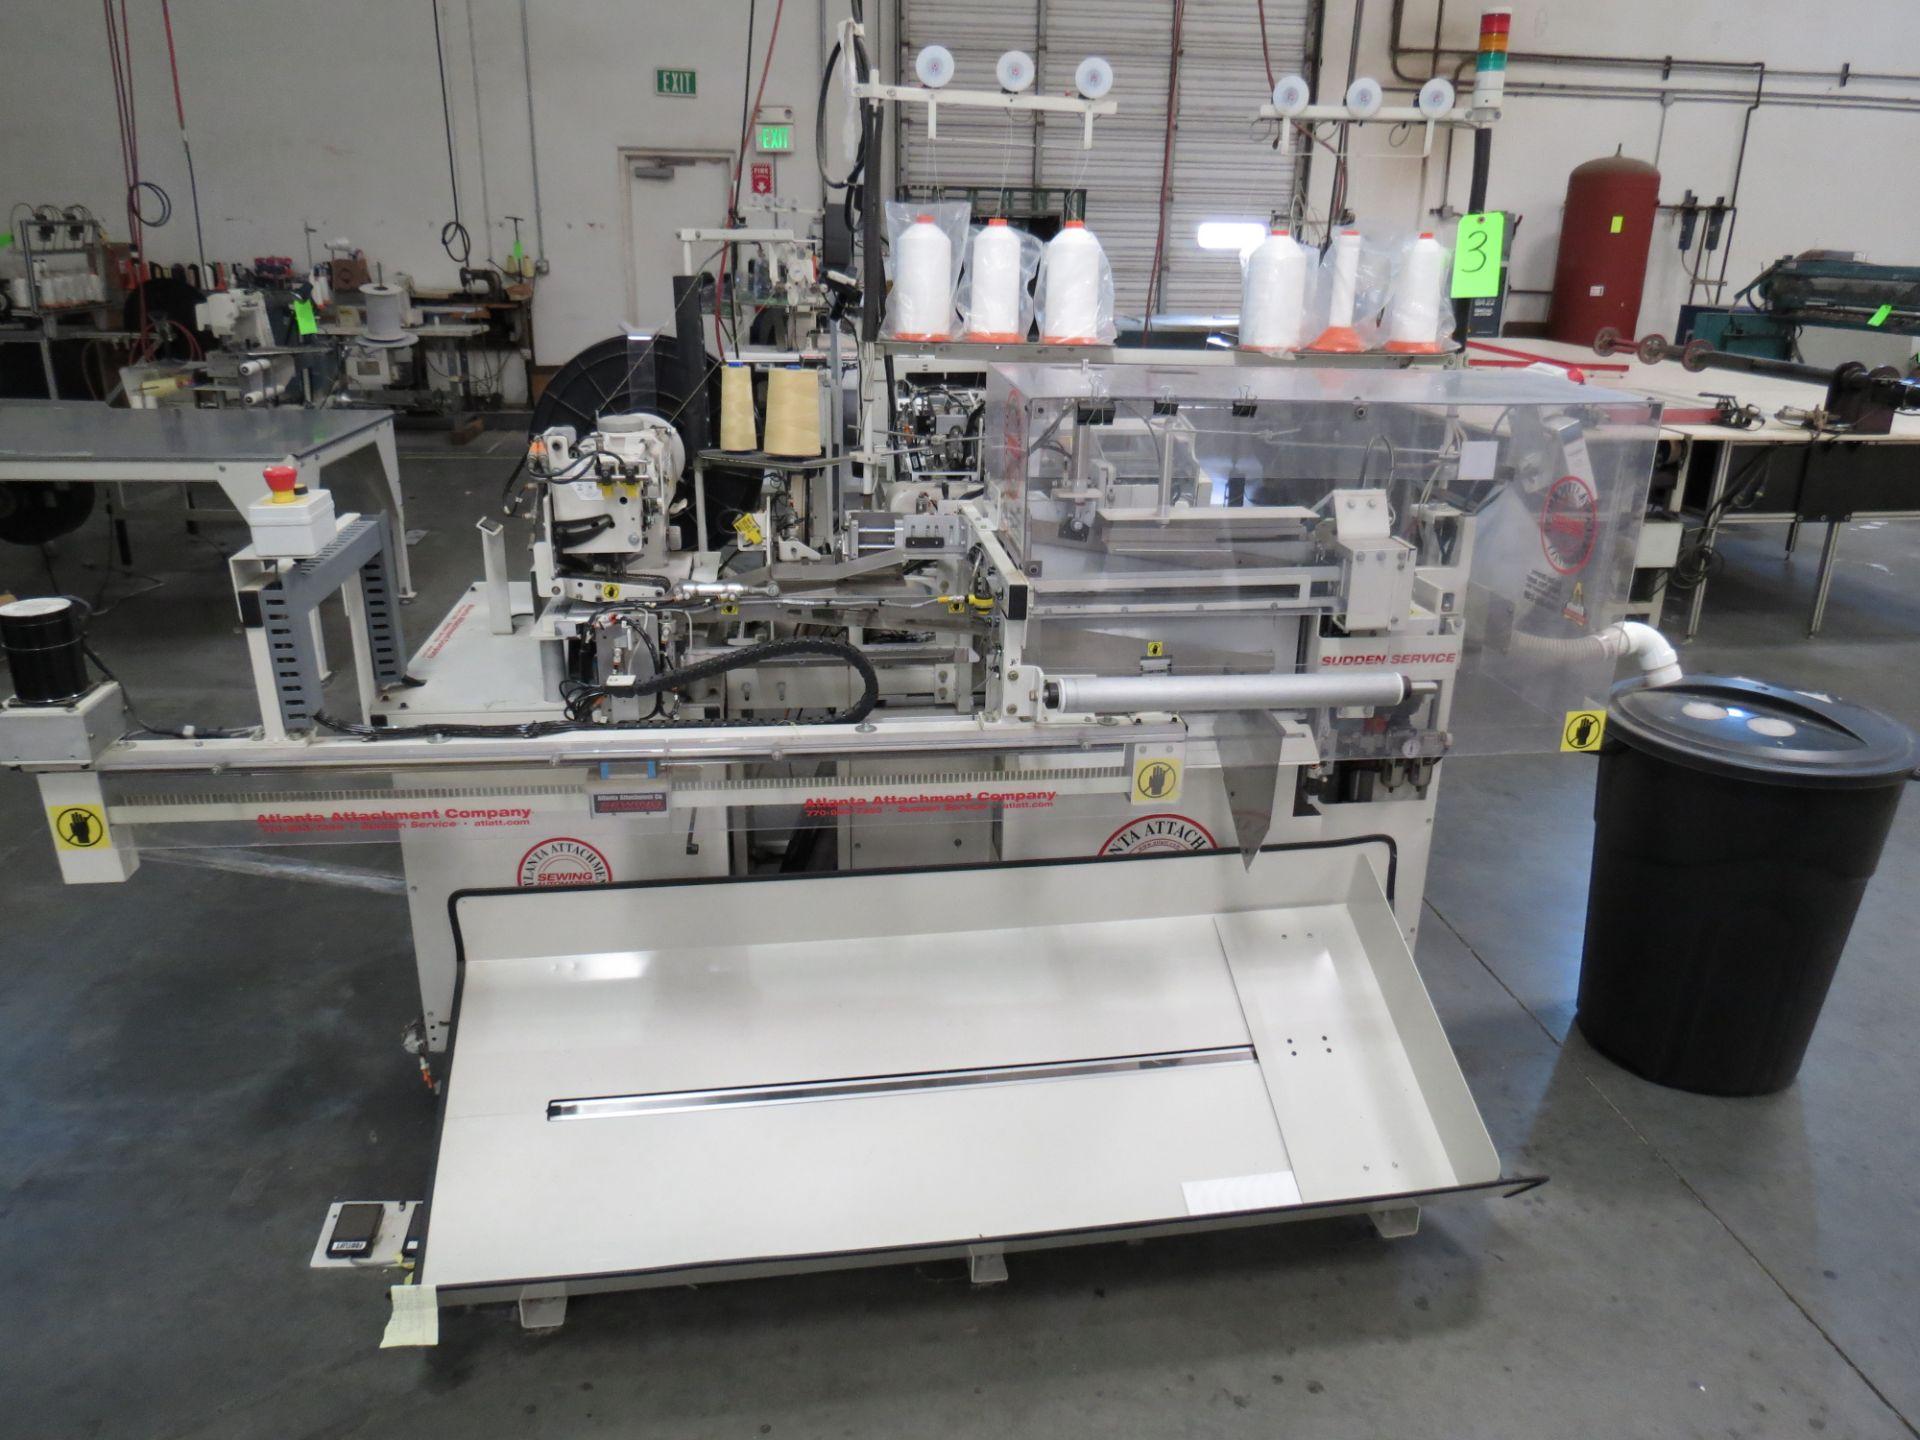 Atlanta Attachment Company, 4300BBorder/Attach Handles Sewing Machine, 220V, SN:209227071609, Juki - Image 2 of 11